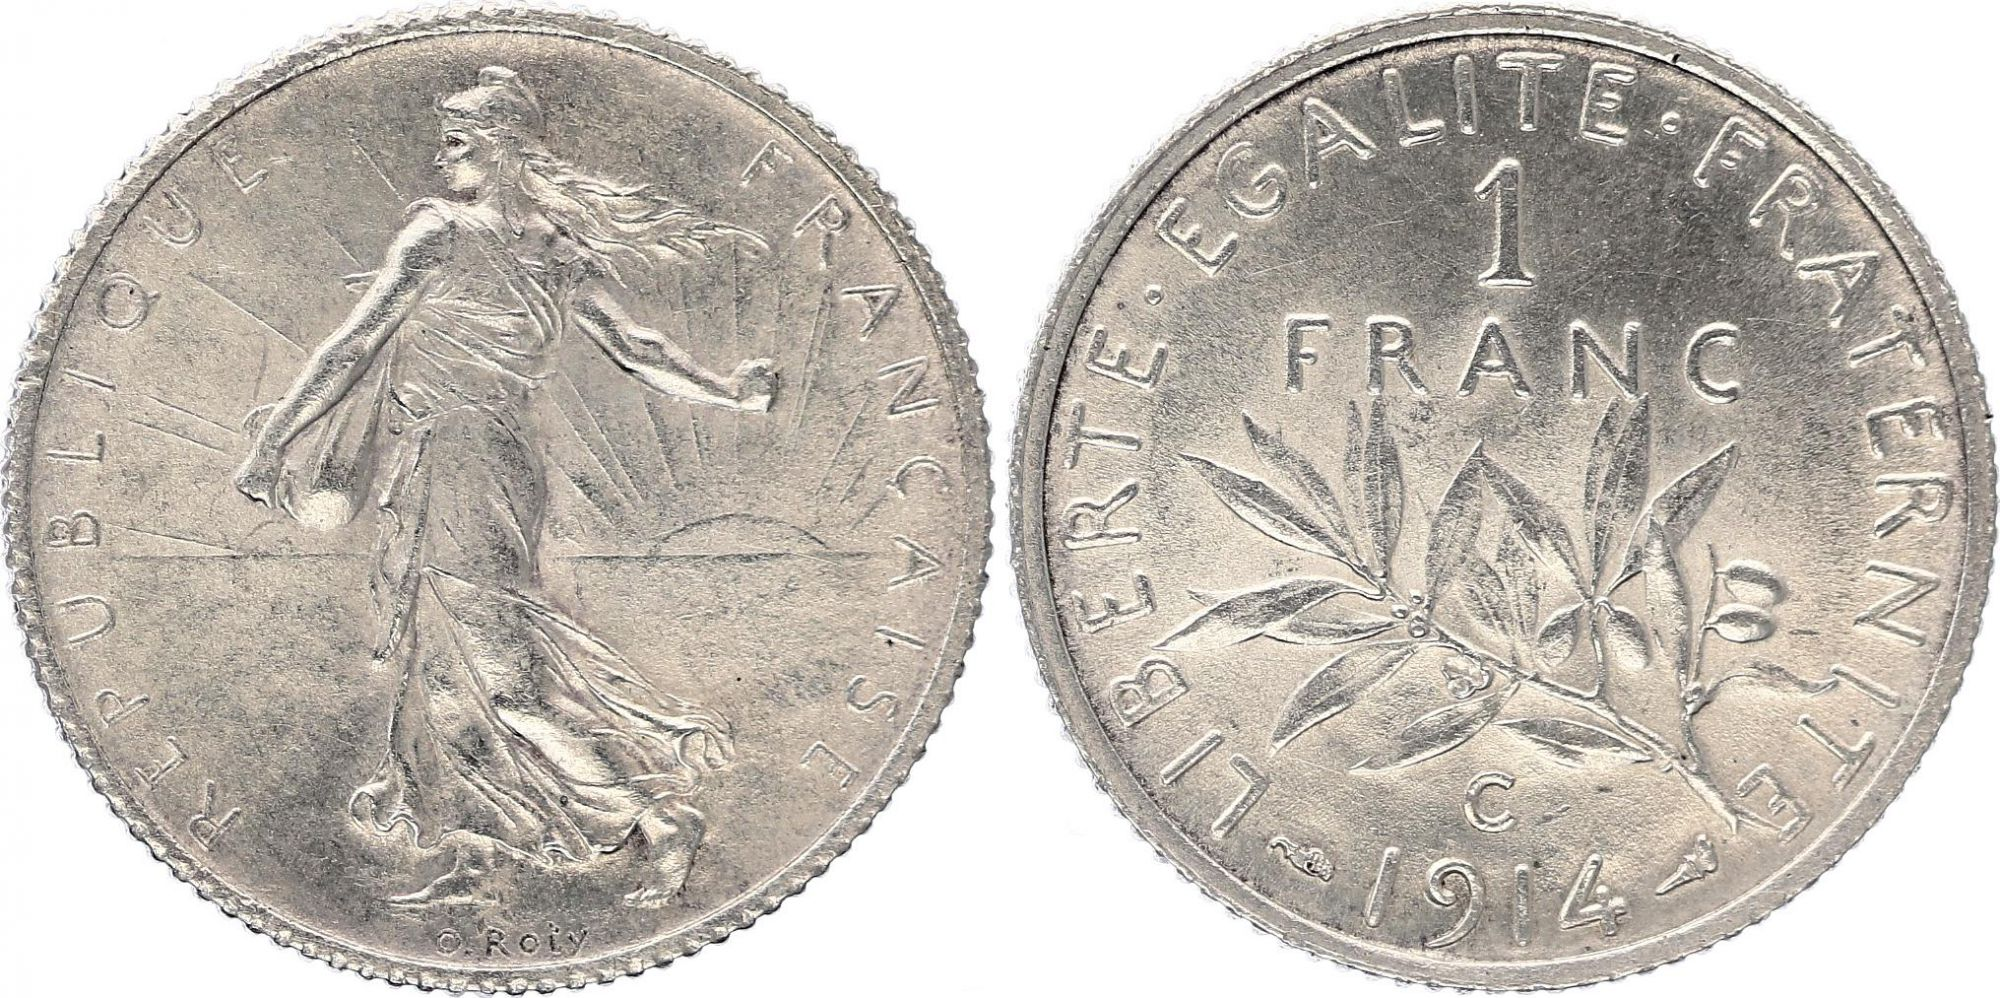 France 1 Franc - 1914 C Castelsarrasin - Silver - Scarce